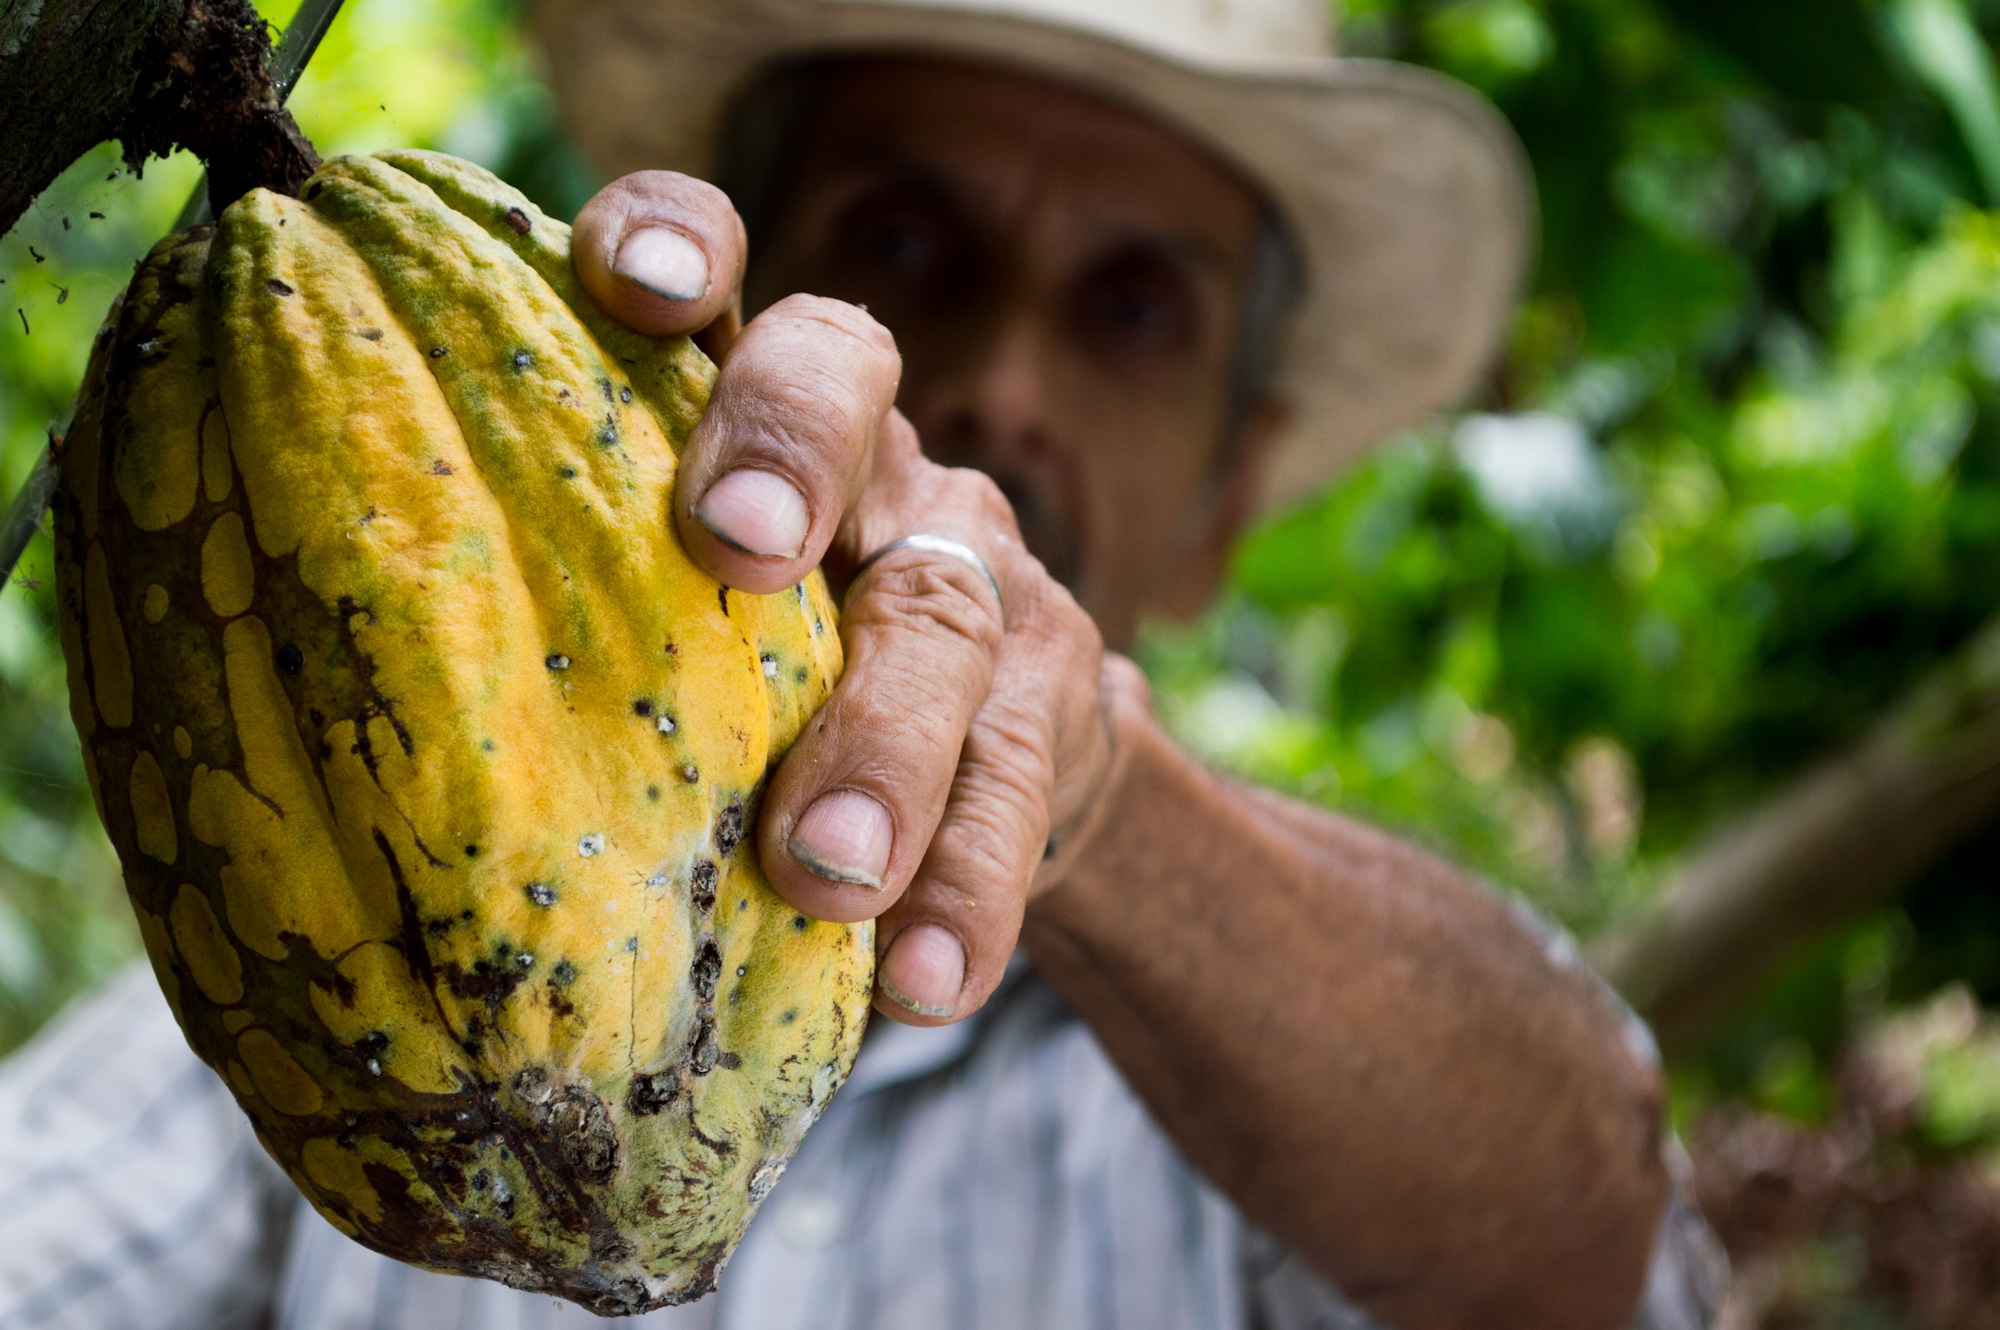 Terra Isara : imaginer l'agriculture et l'alimentation de demain